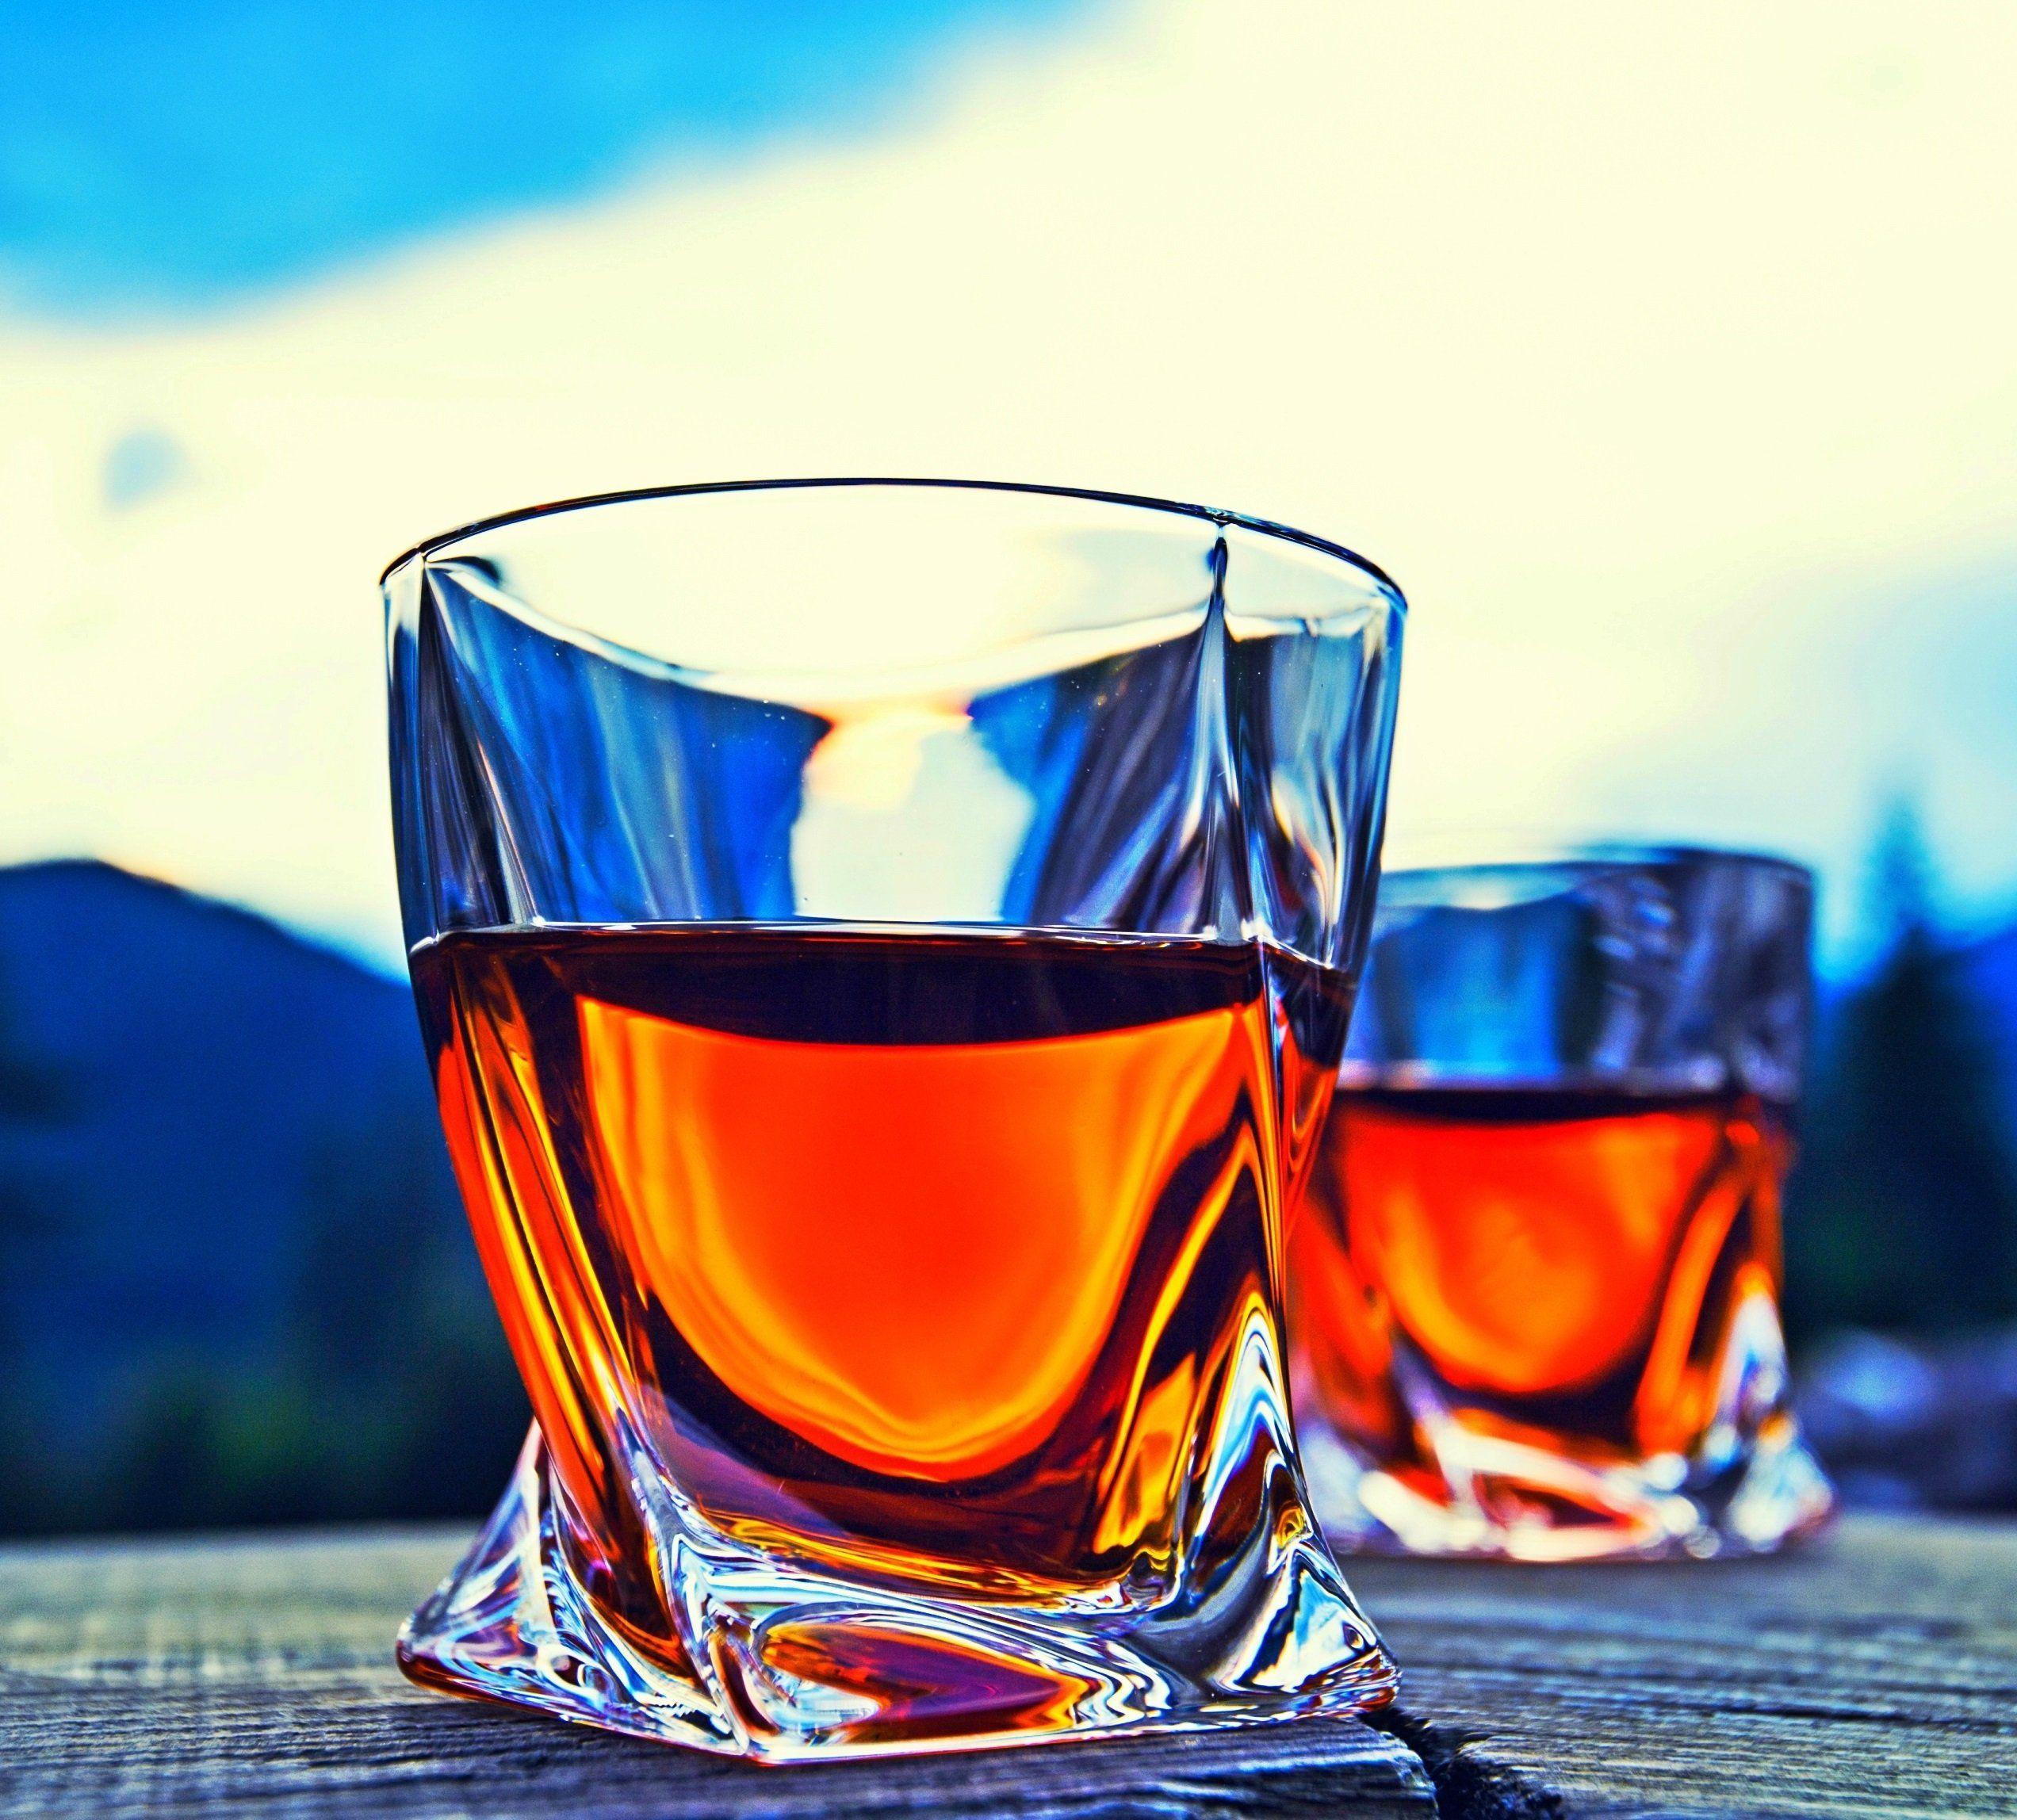 Venero Whiskey Glasses Set of 4 Premium LeadFree Crystal